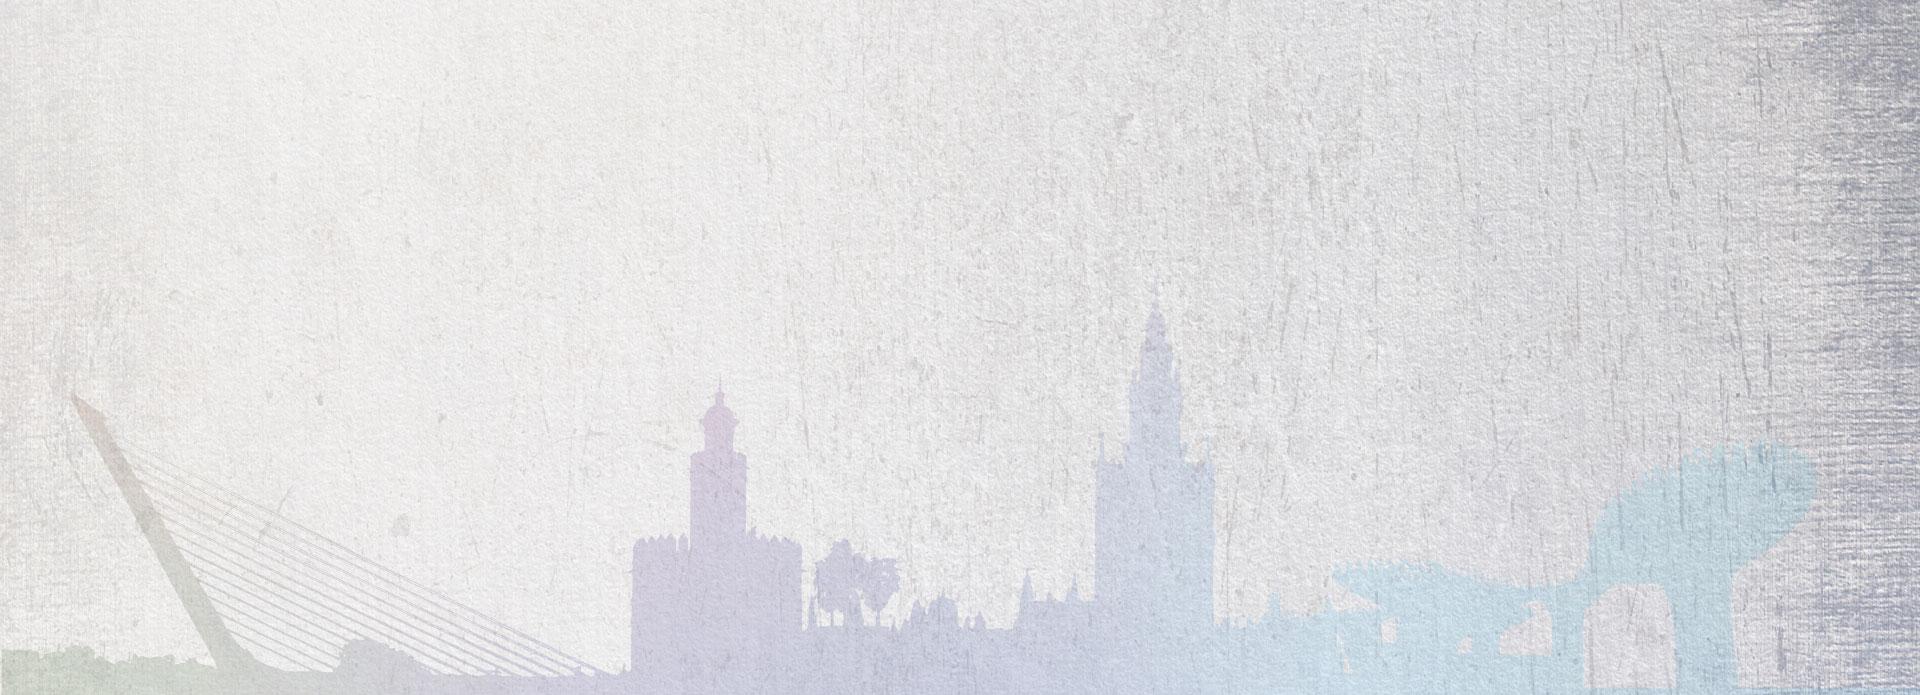 fondo premio embajador sevilla city centre